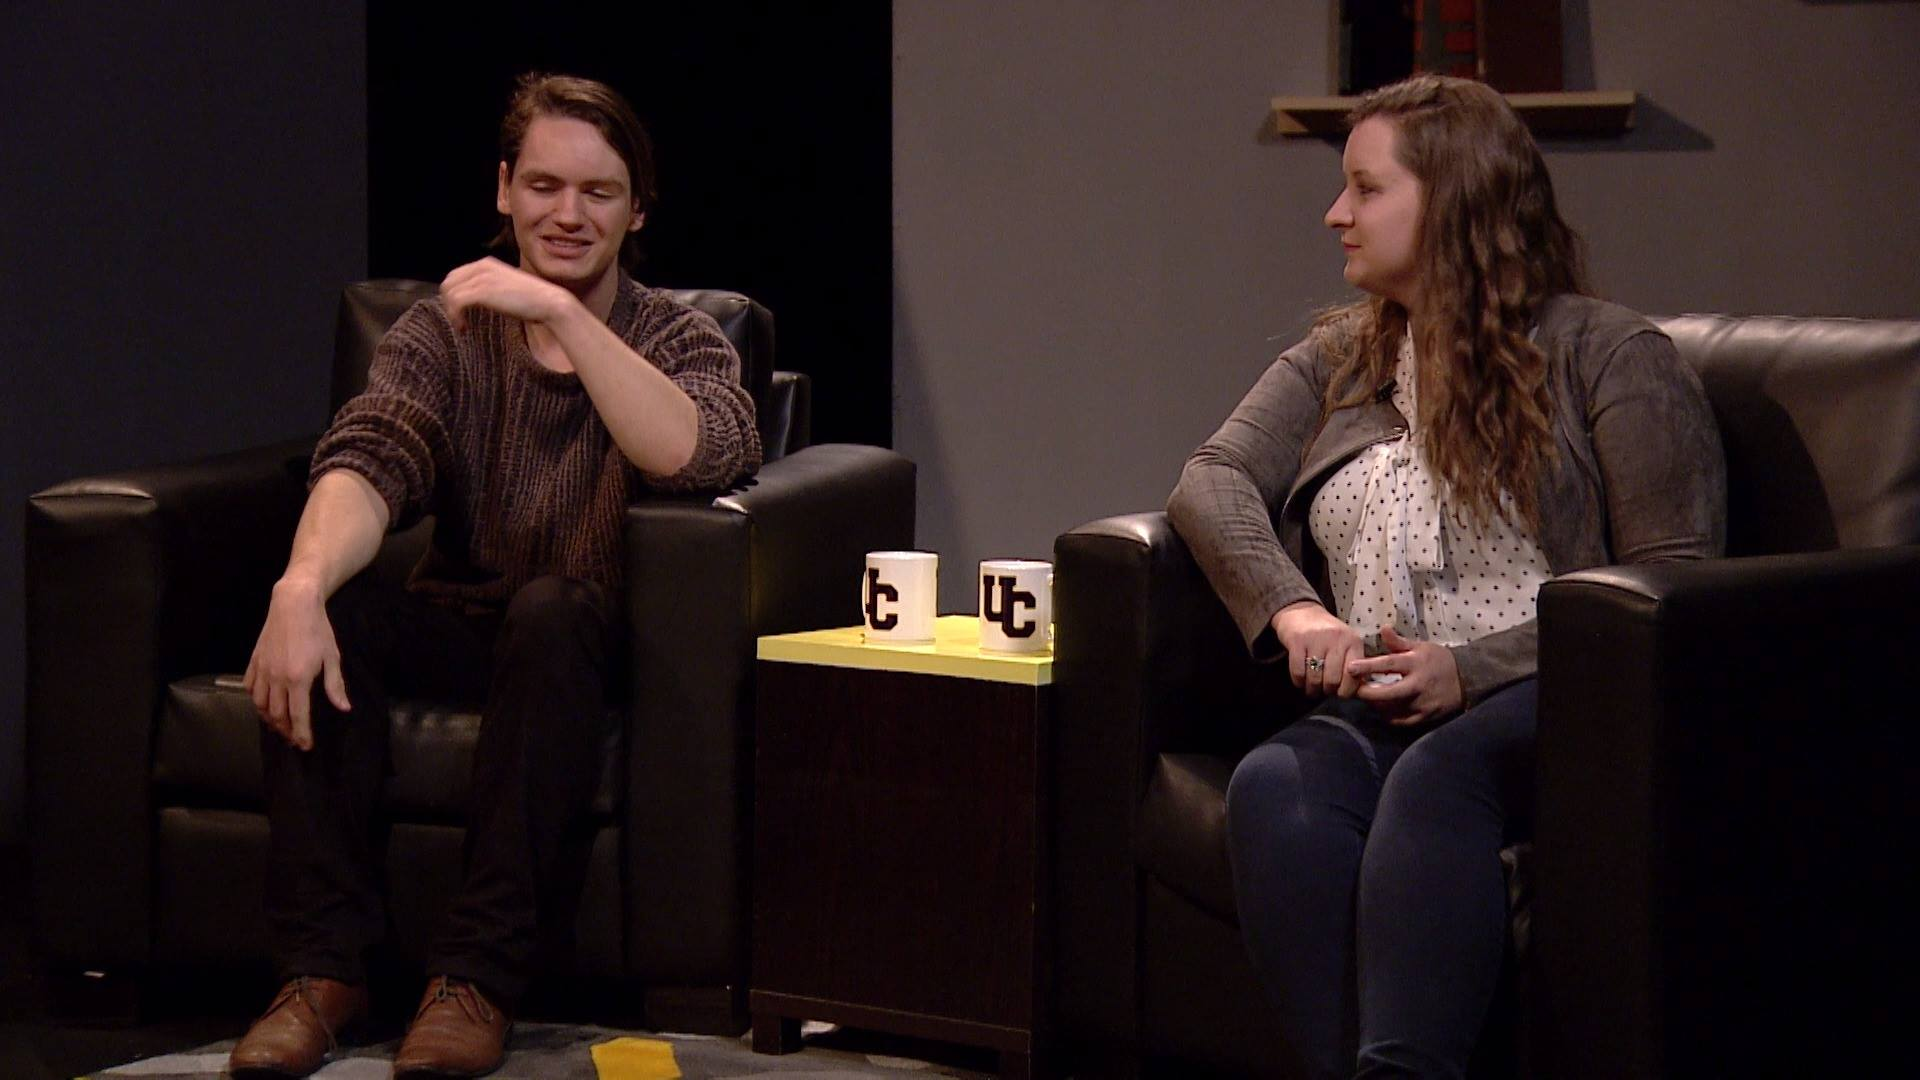 University Confessions: Episode 1